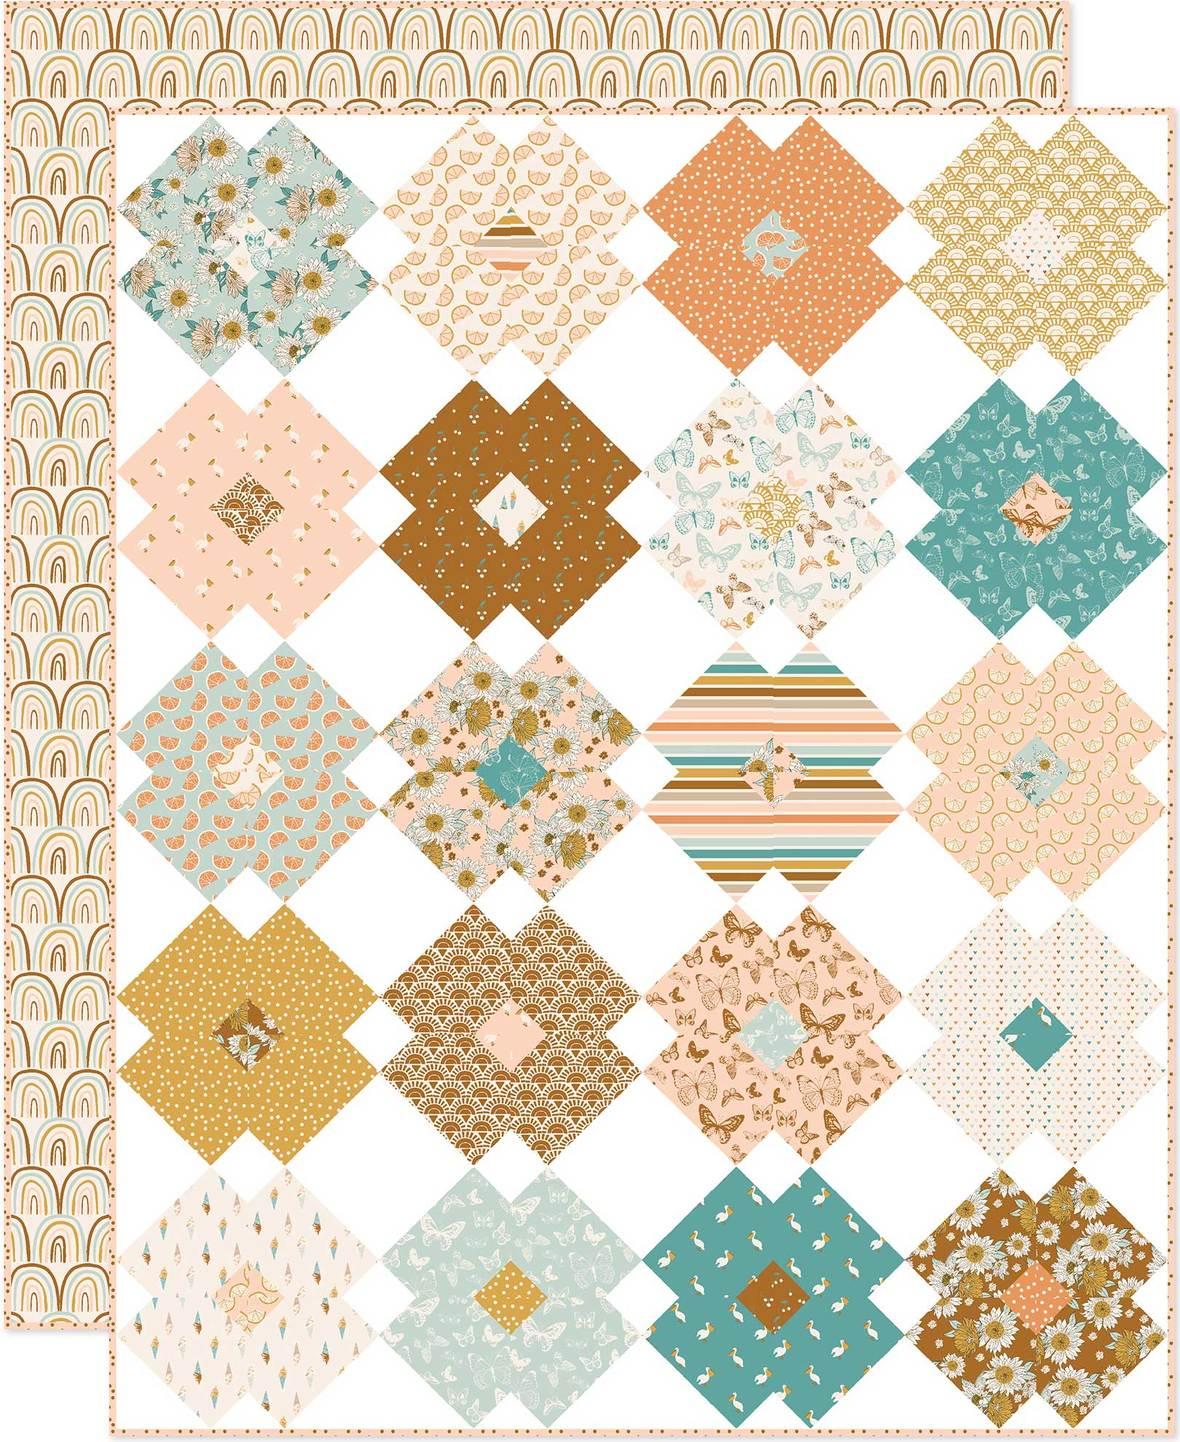 Flower-Tile-Boho-Summer-with-backing